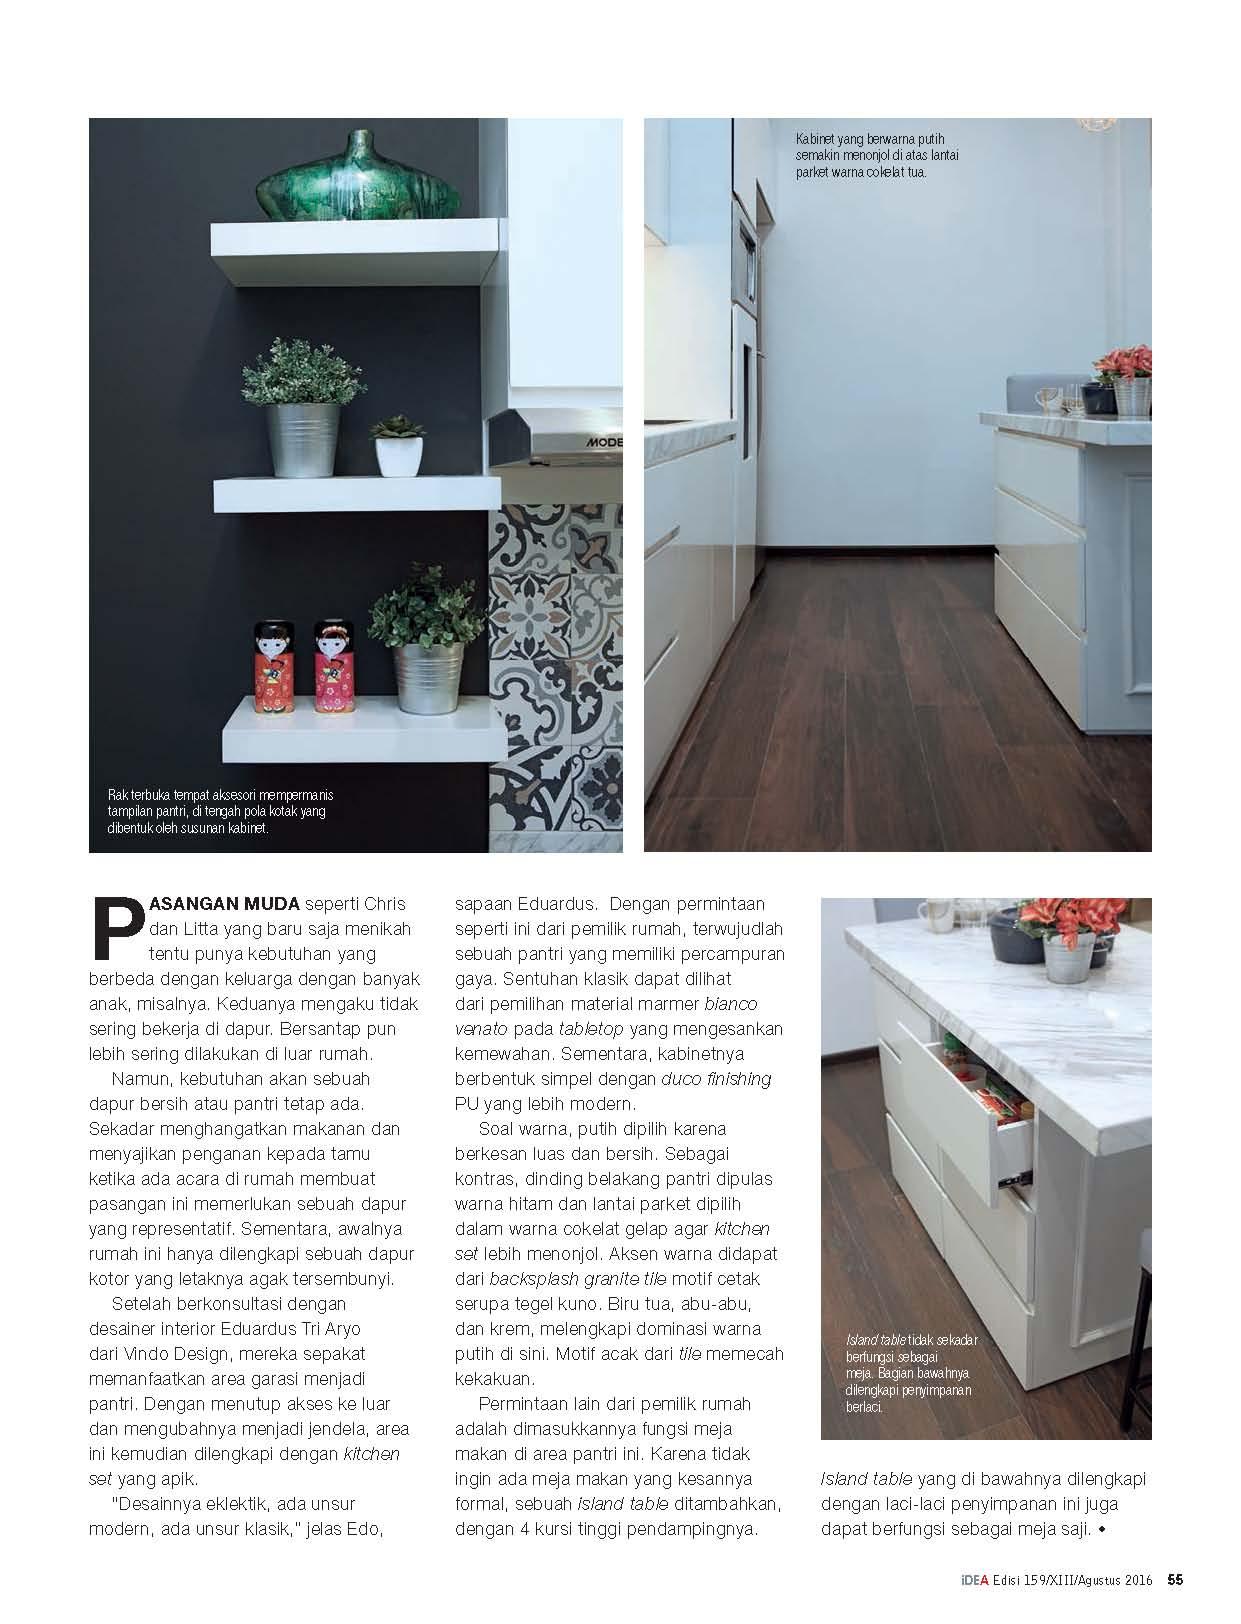 Simple Elegant Kitchen in iDEA Magazine